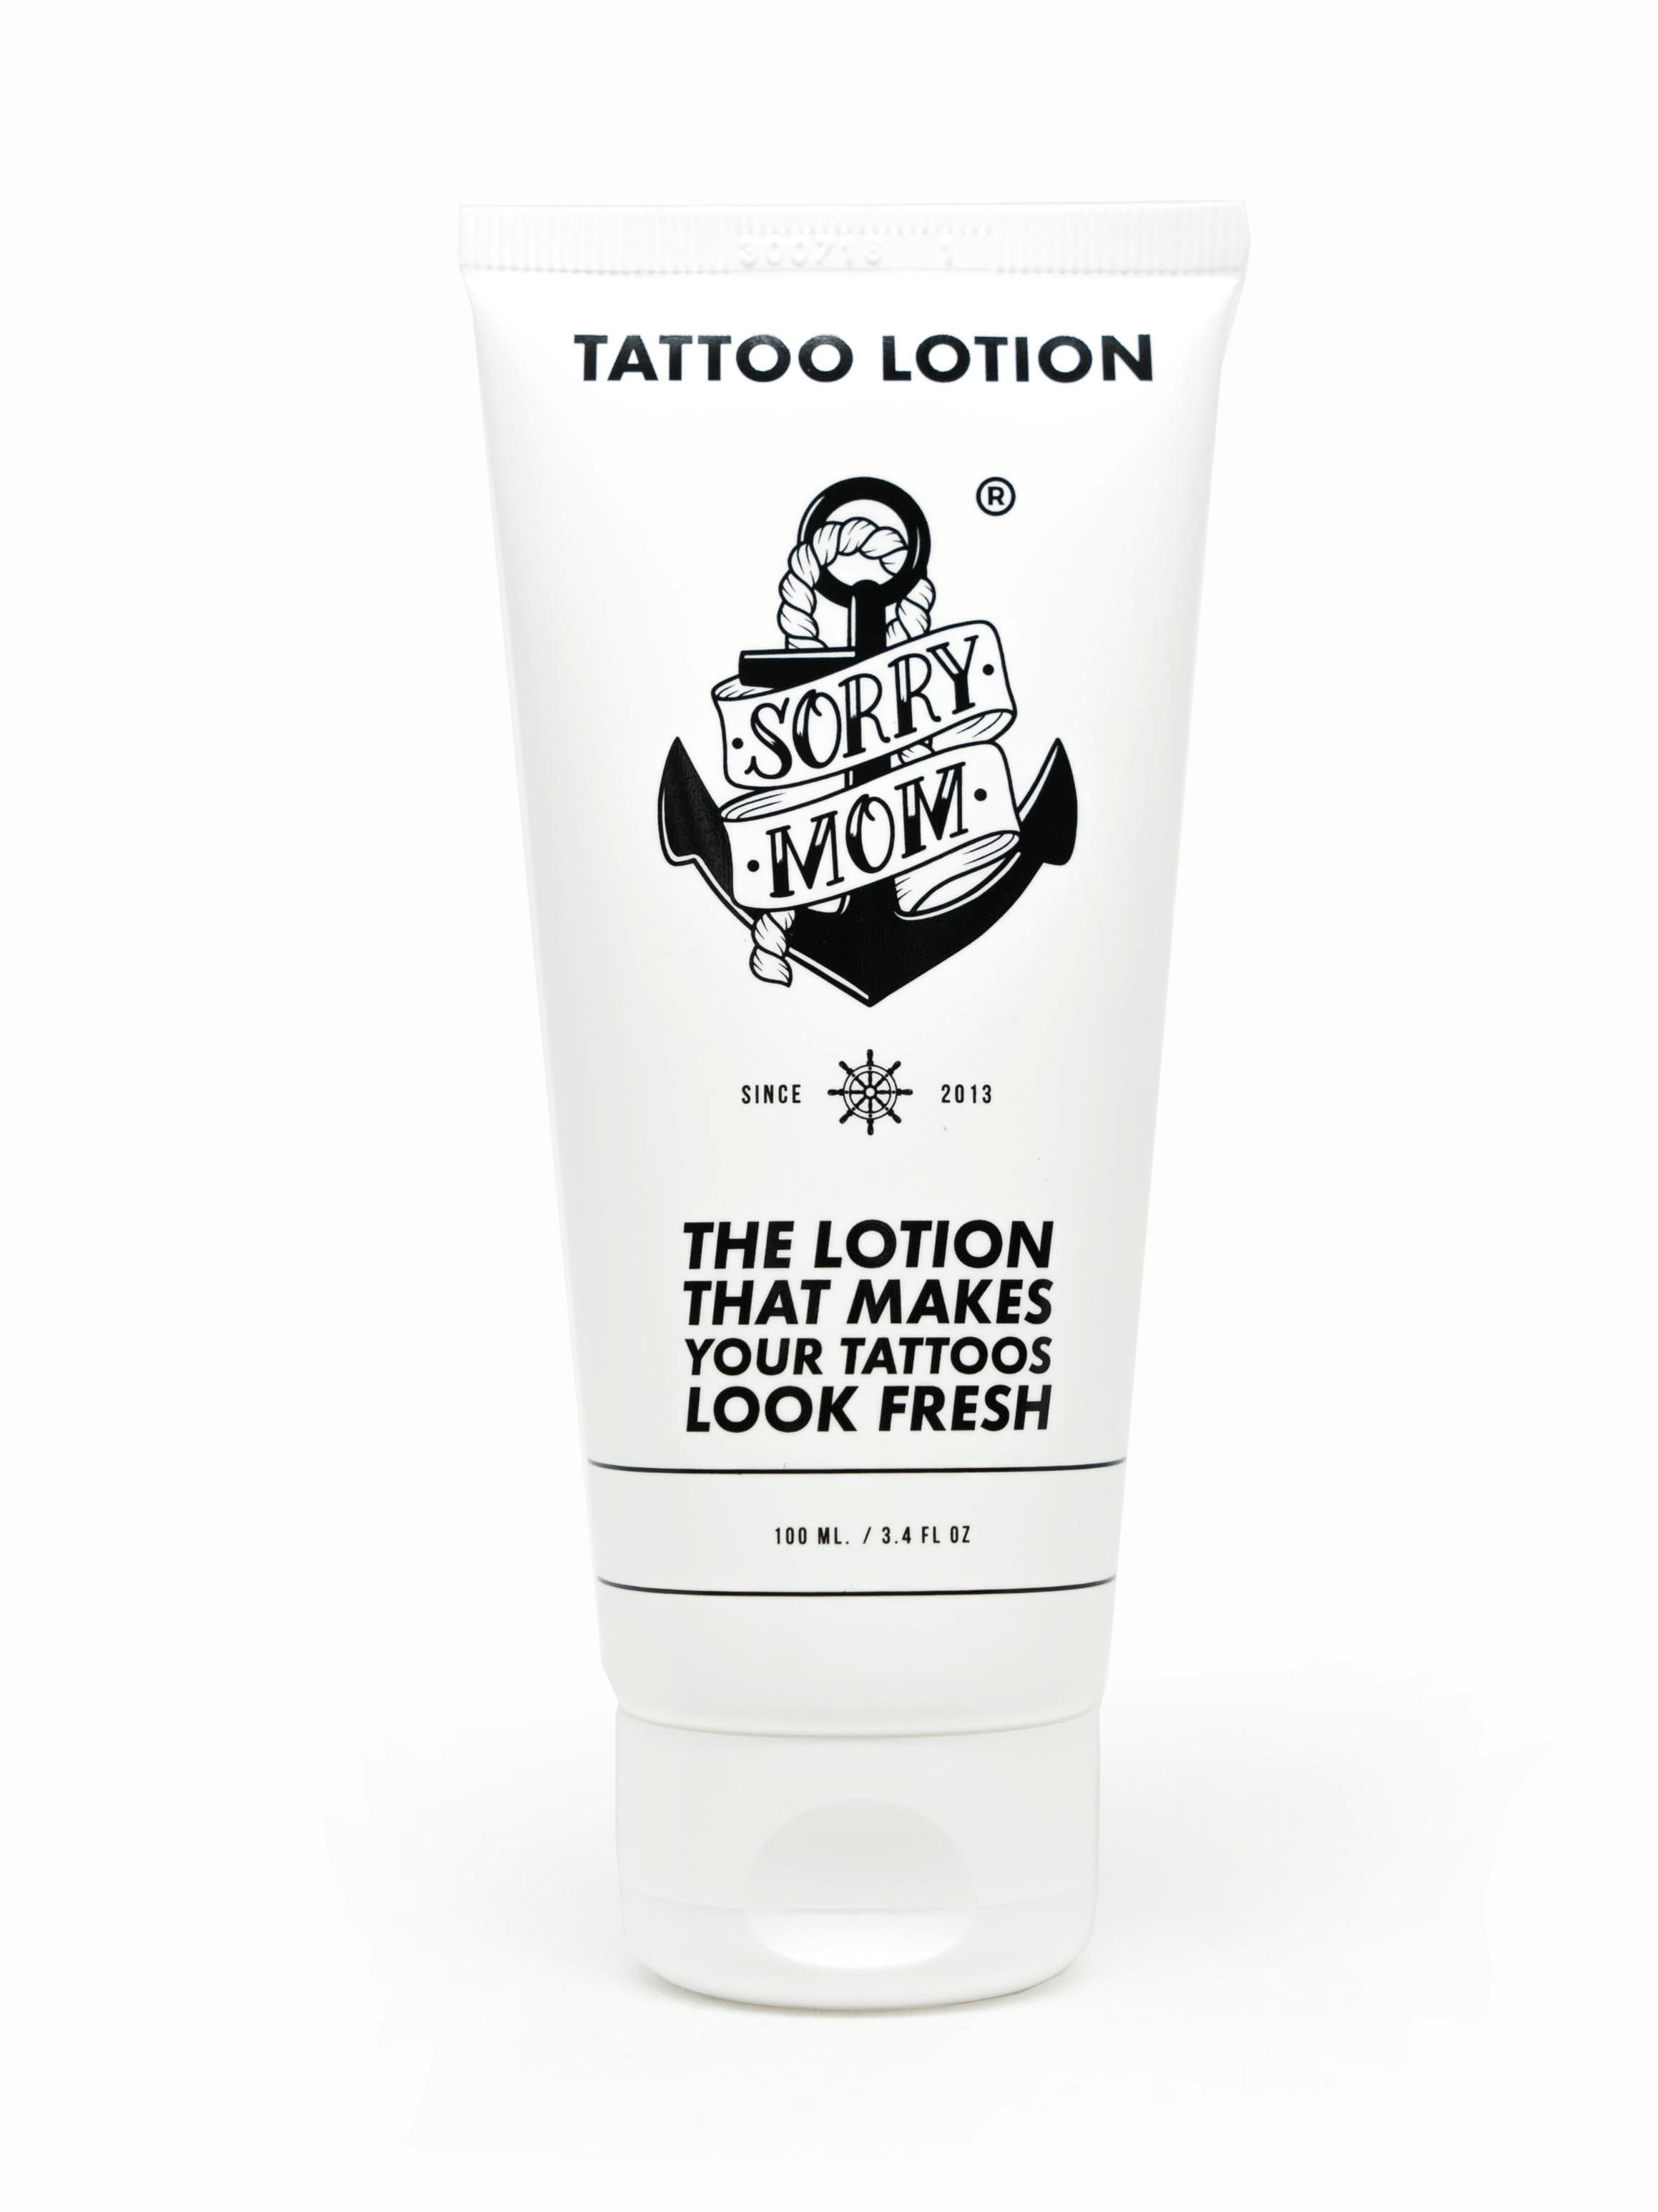 Sorry Mom - Tattoo Lotion 100 ML